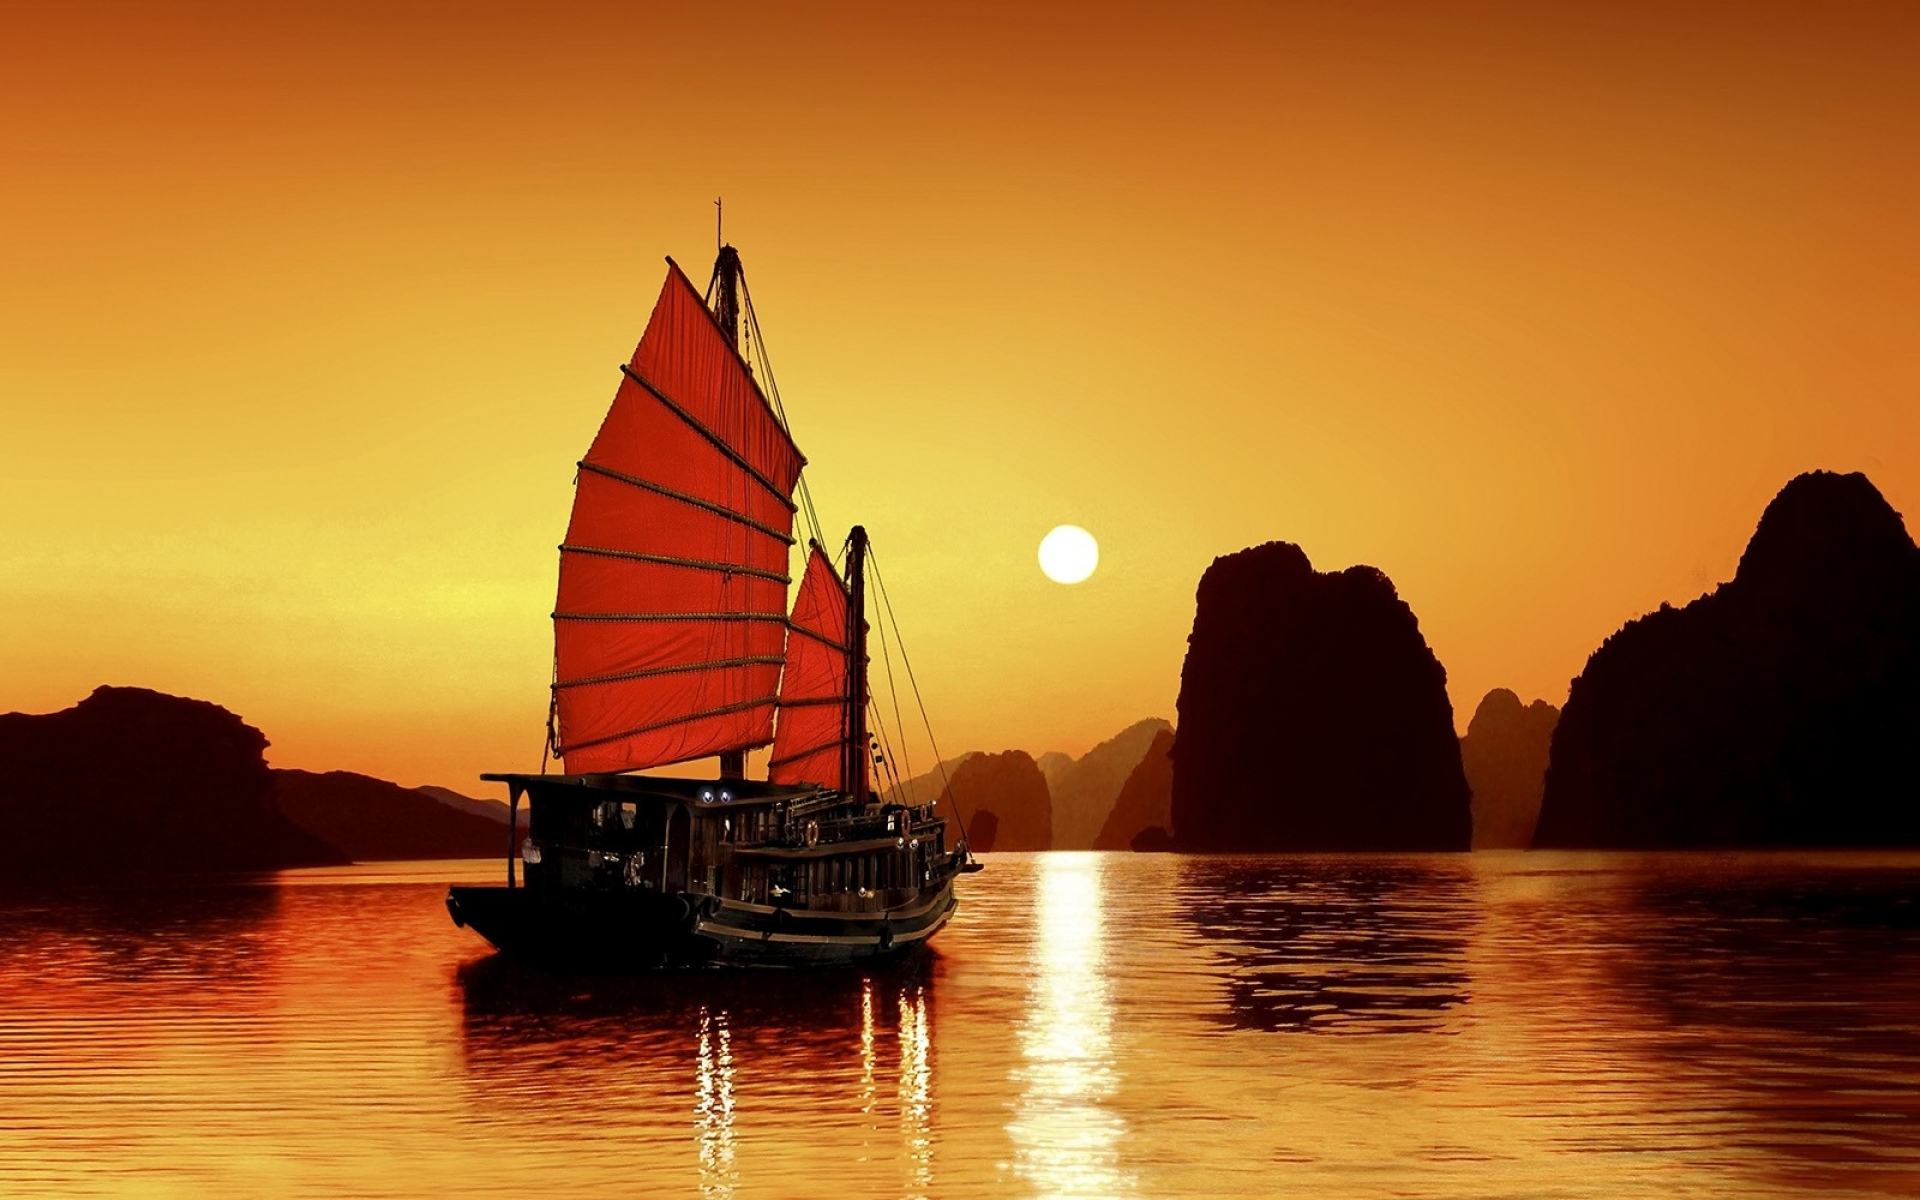 nature_sun_silhouette_rocks_viet_nam_boats_seascapes_reflections_1600x1200_wallpaper_Wallpaper_1920x1200_www.wallpaperbeautiful.com